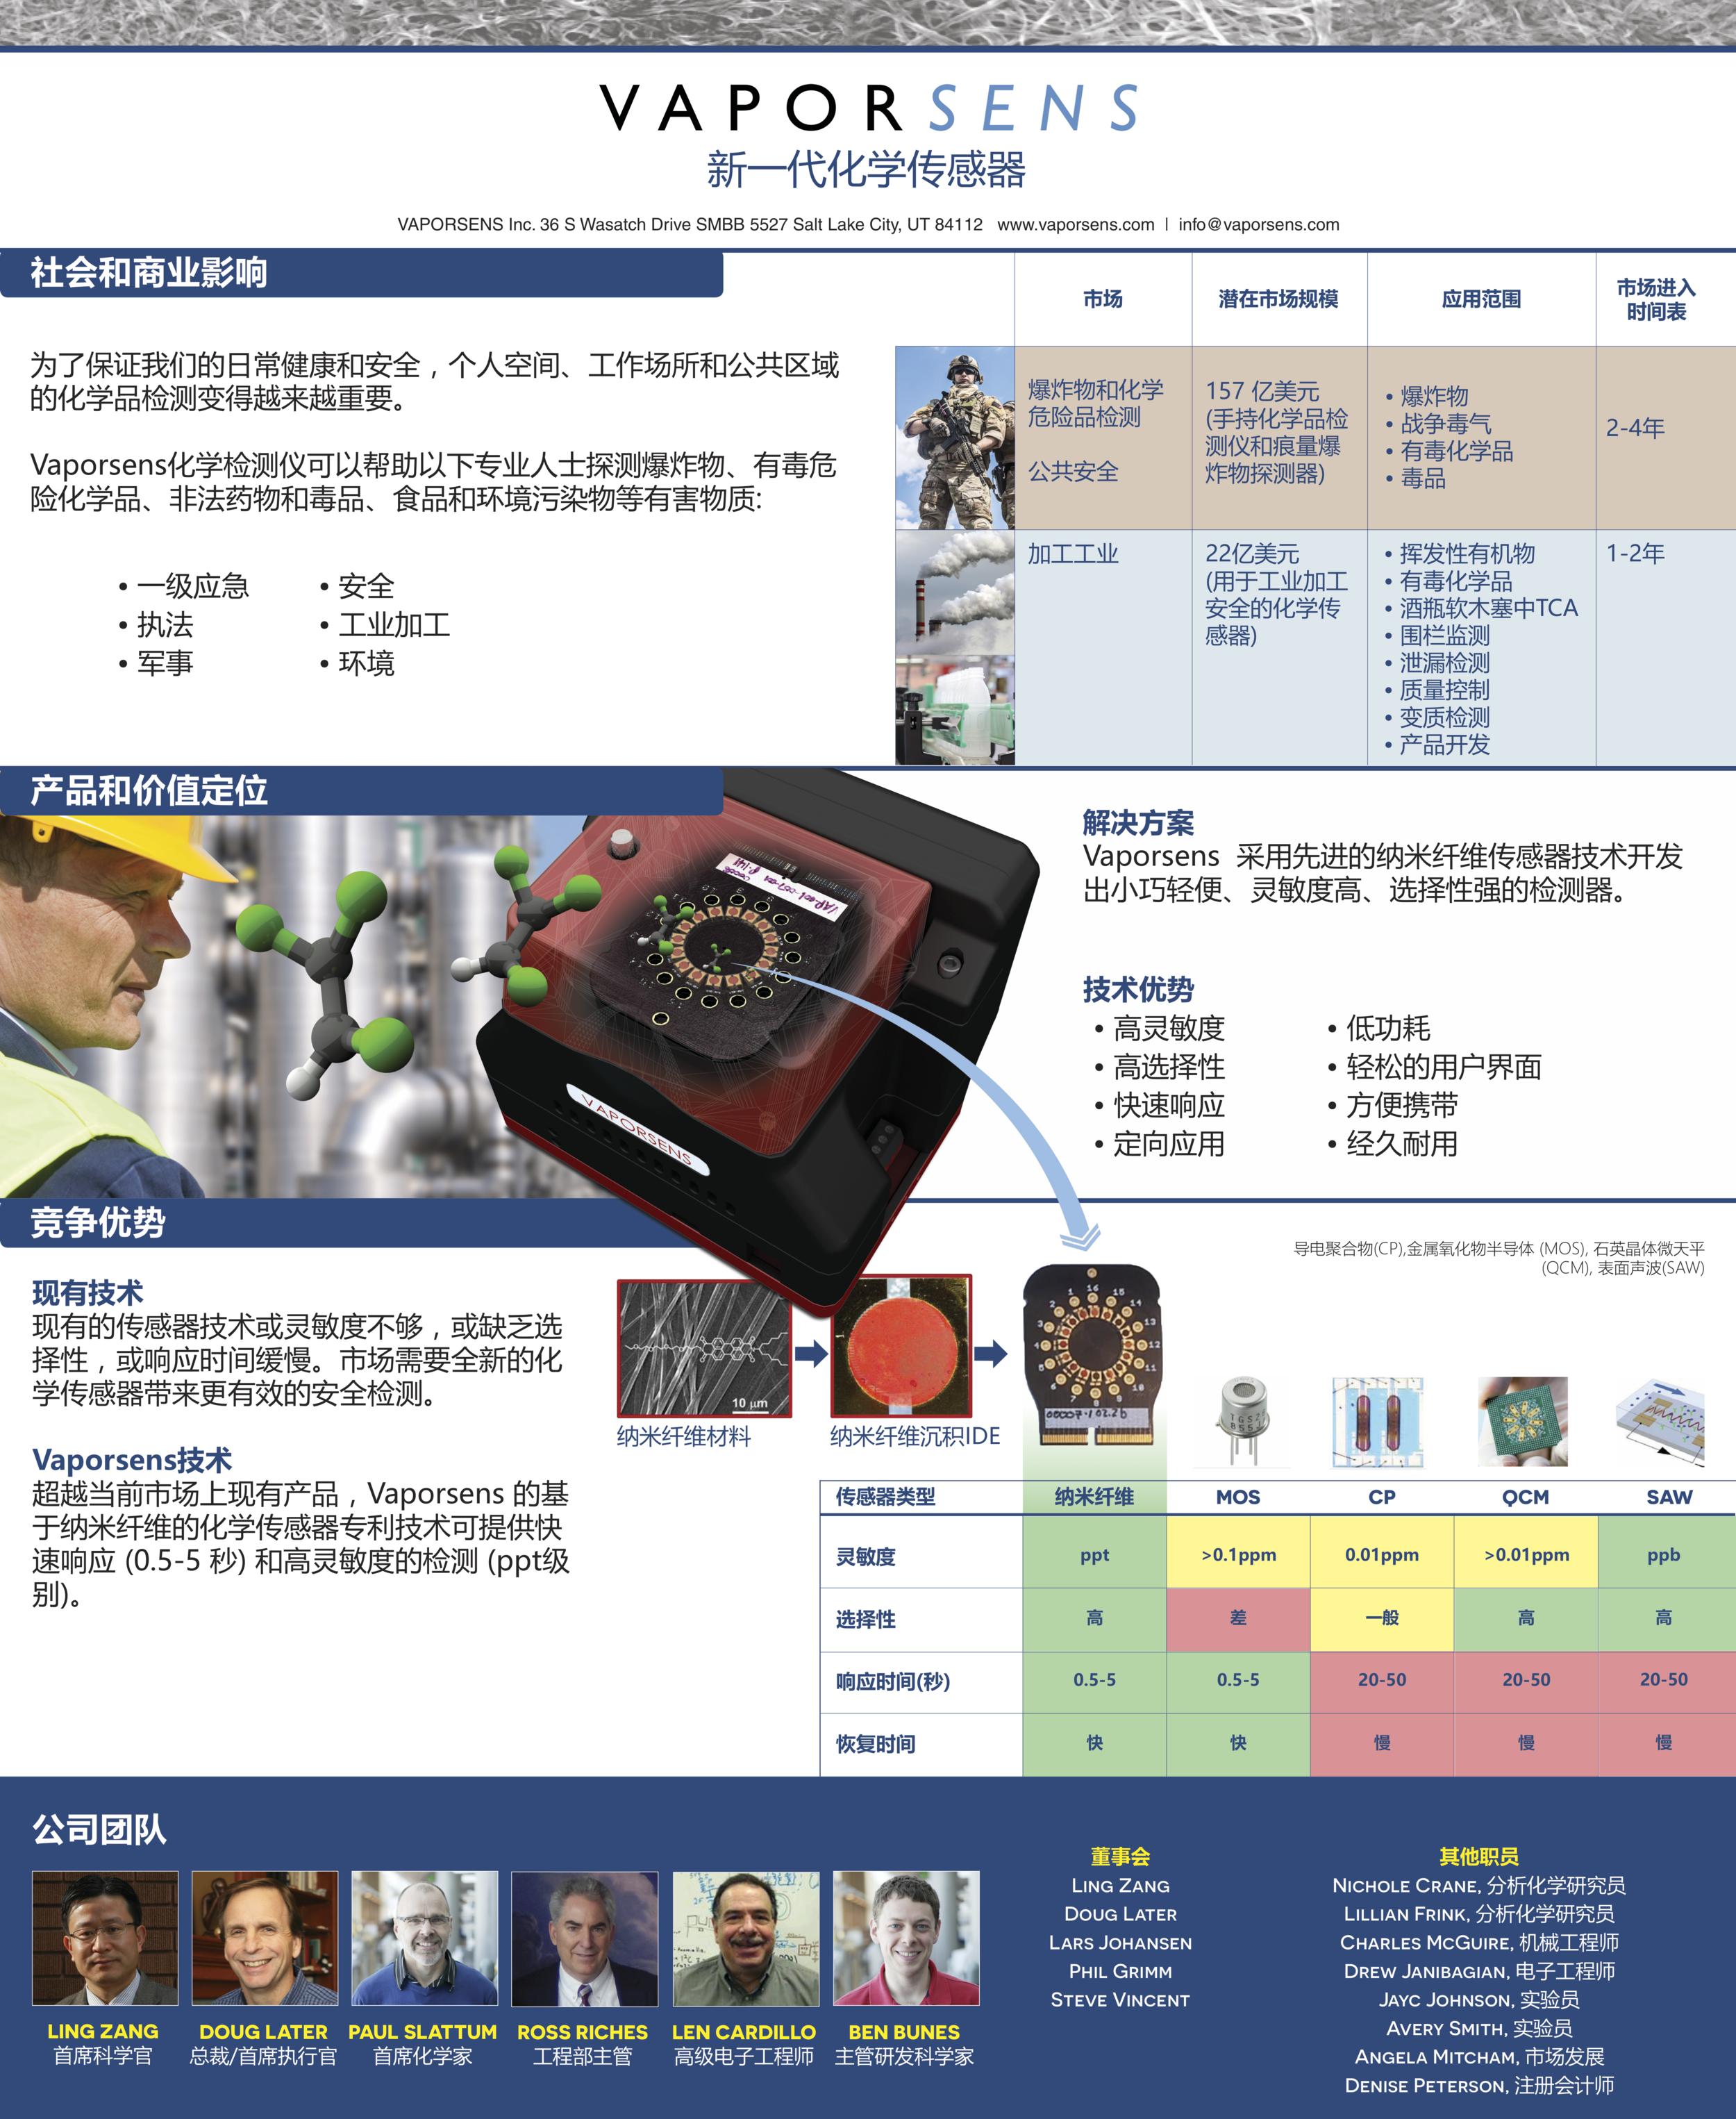 Vaporsens_Sensors Expo Handout_Mandarin.png